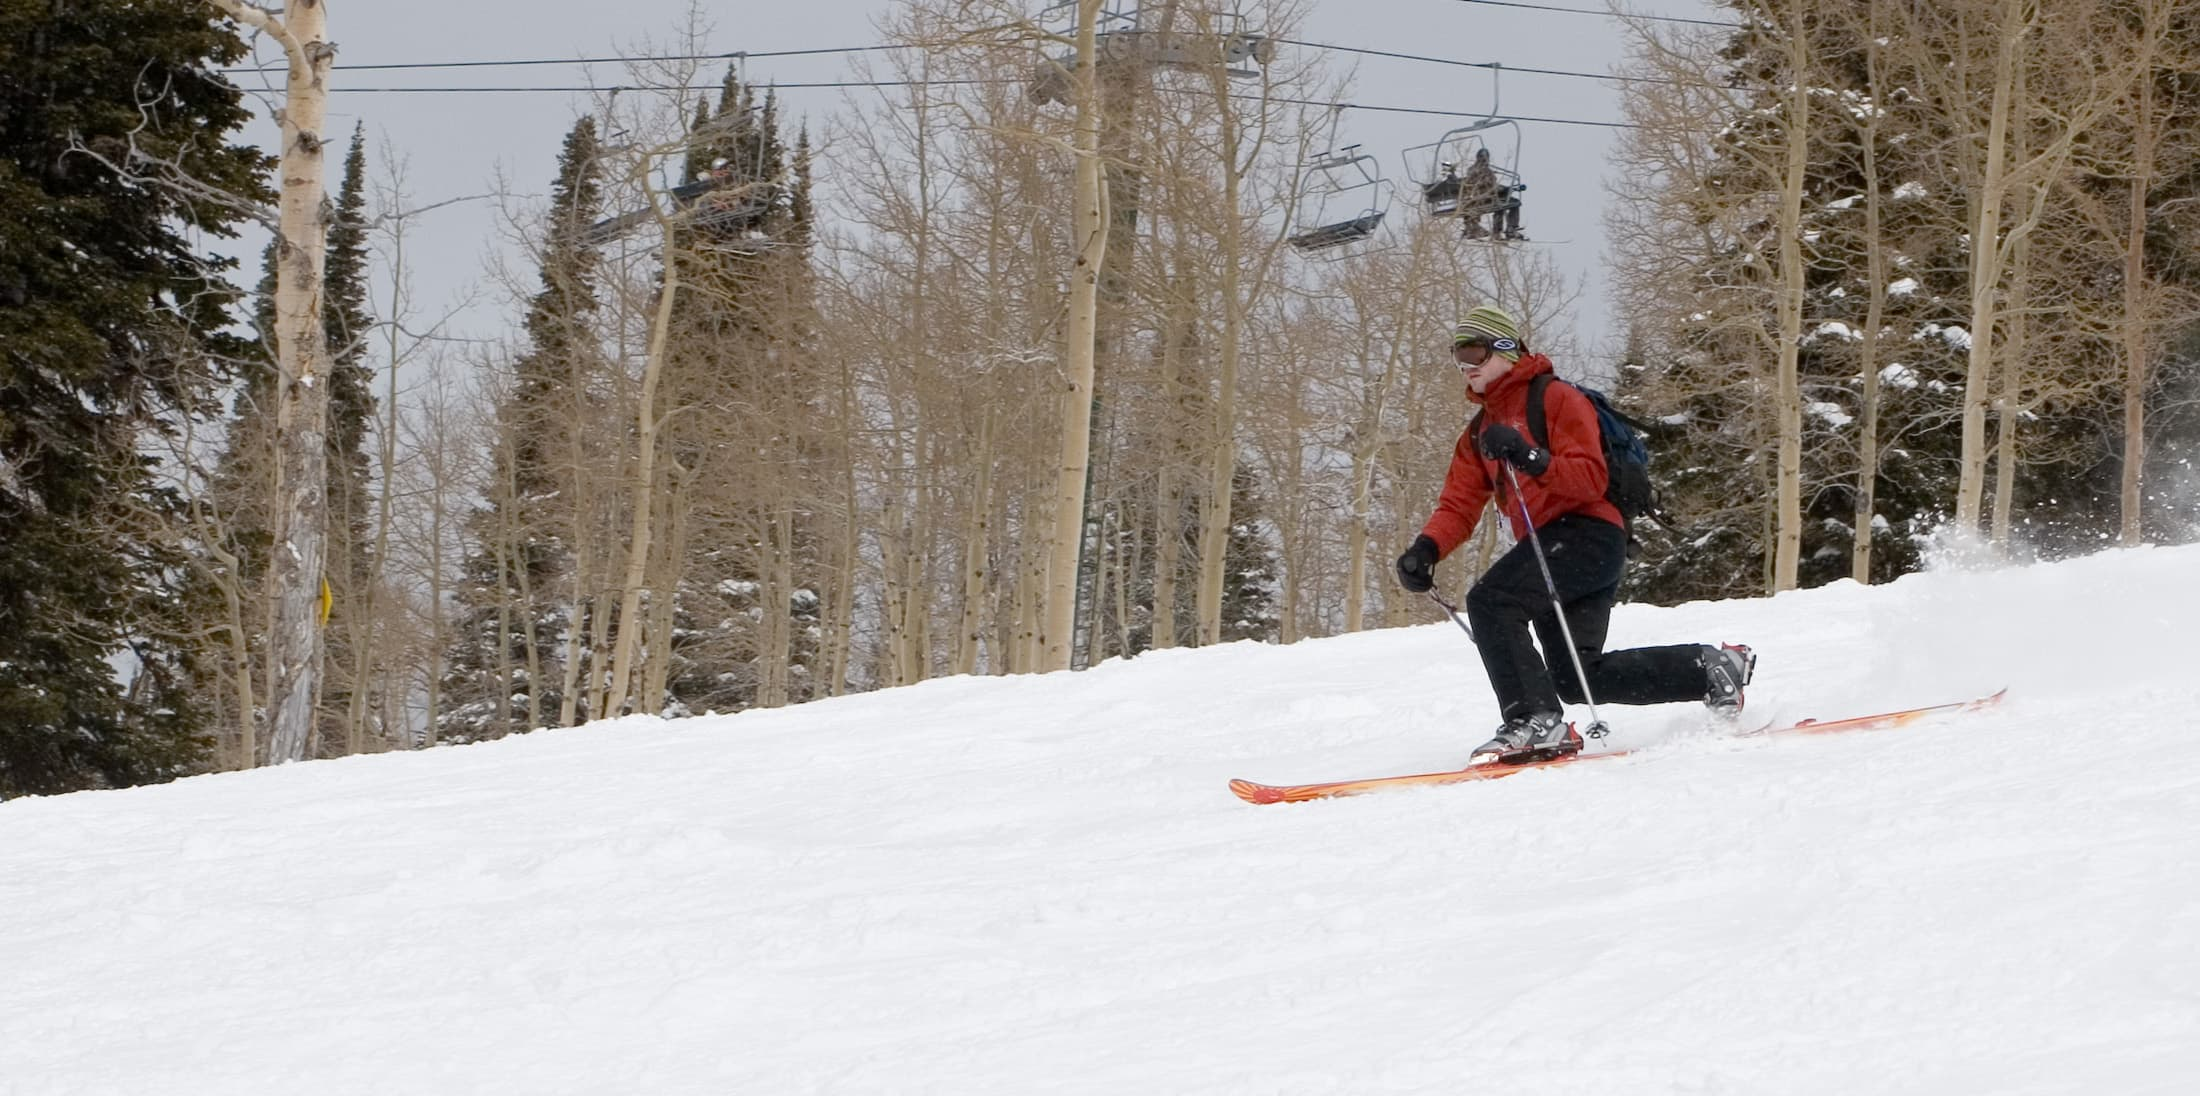 hometown hills: struggling community ski areas explore new financial